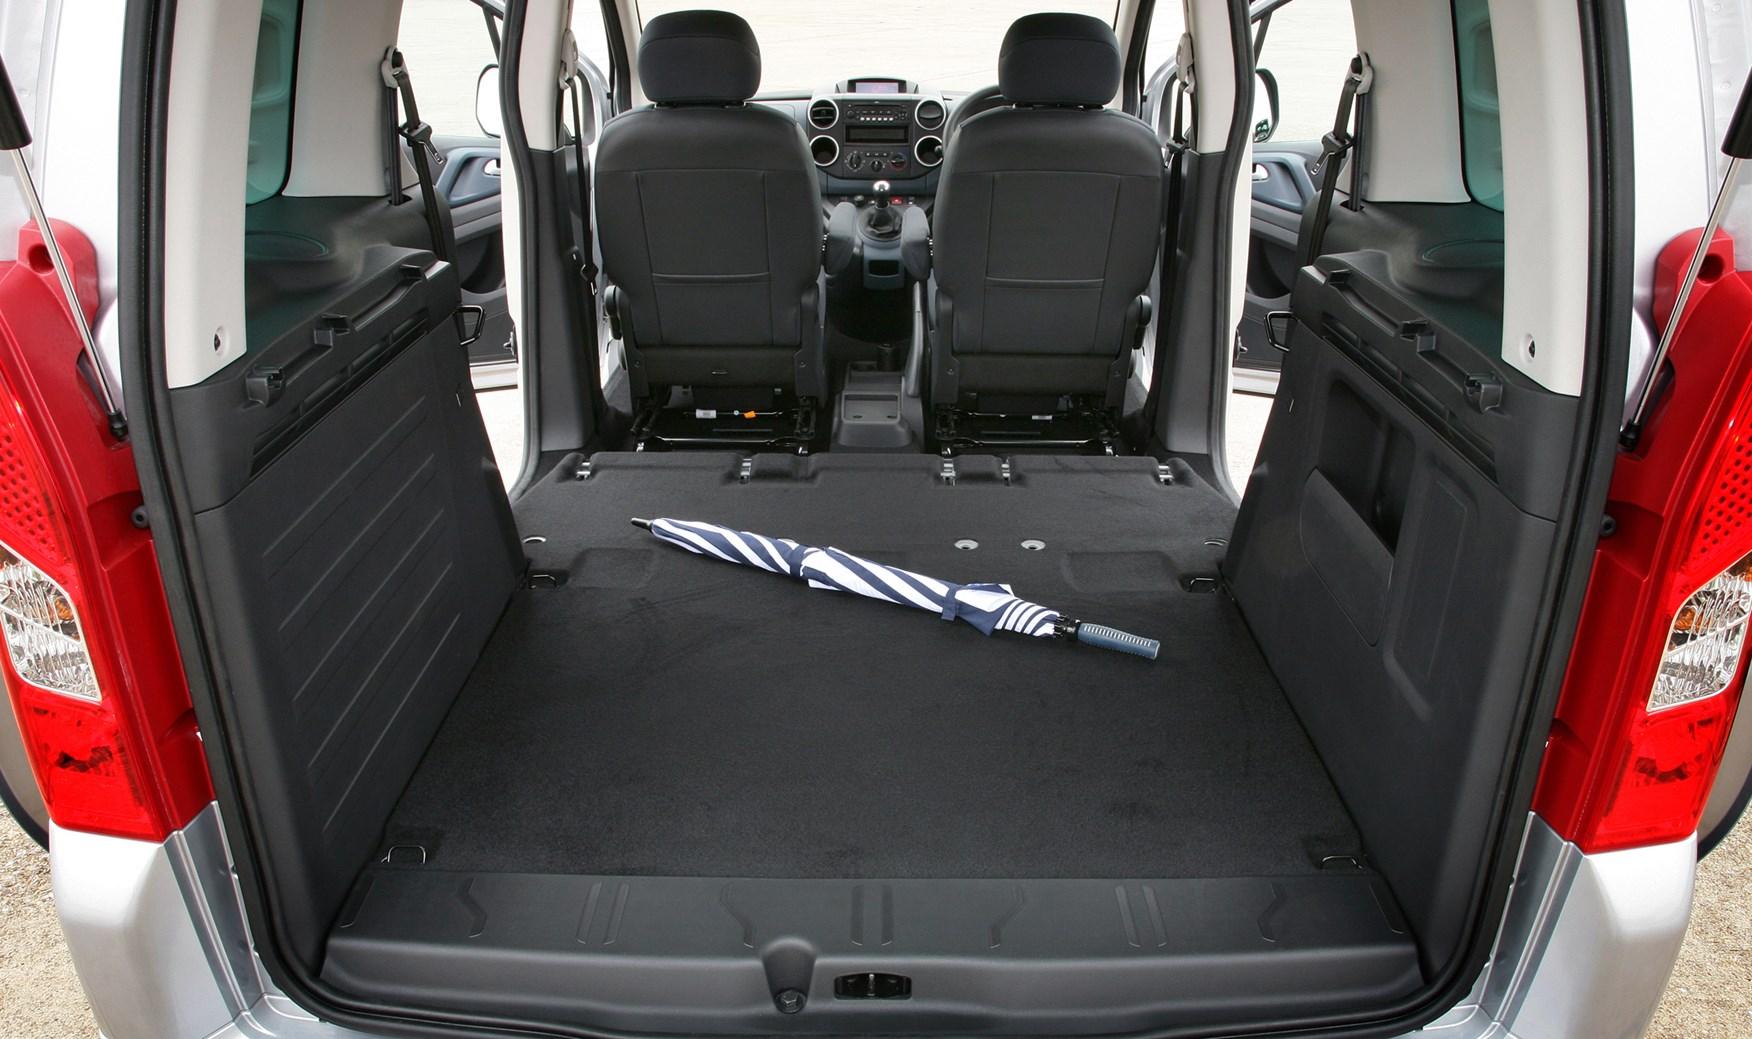 Peugeot Partner II 2008 - 2012 Compact MPV #4